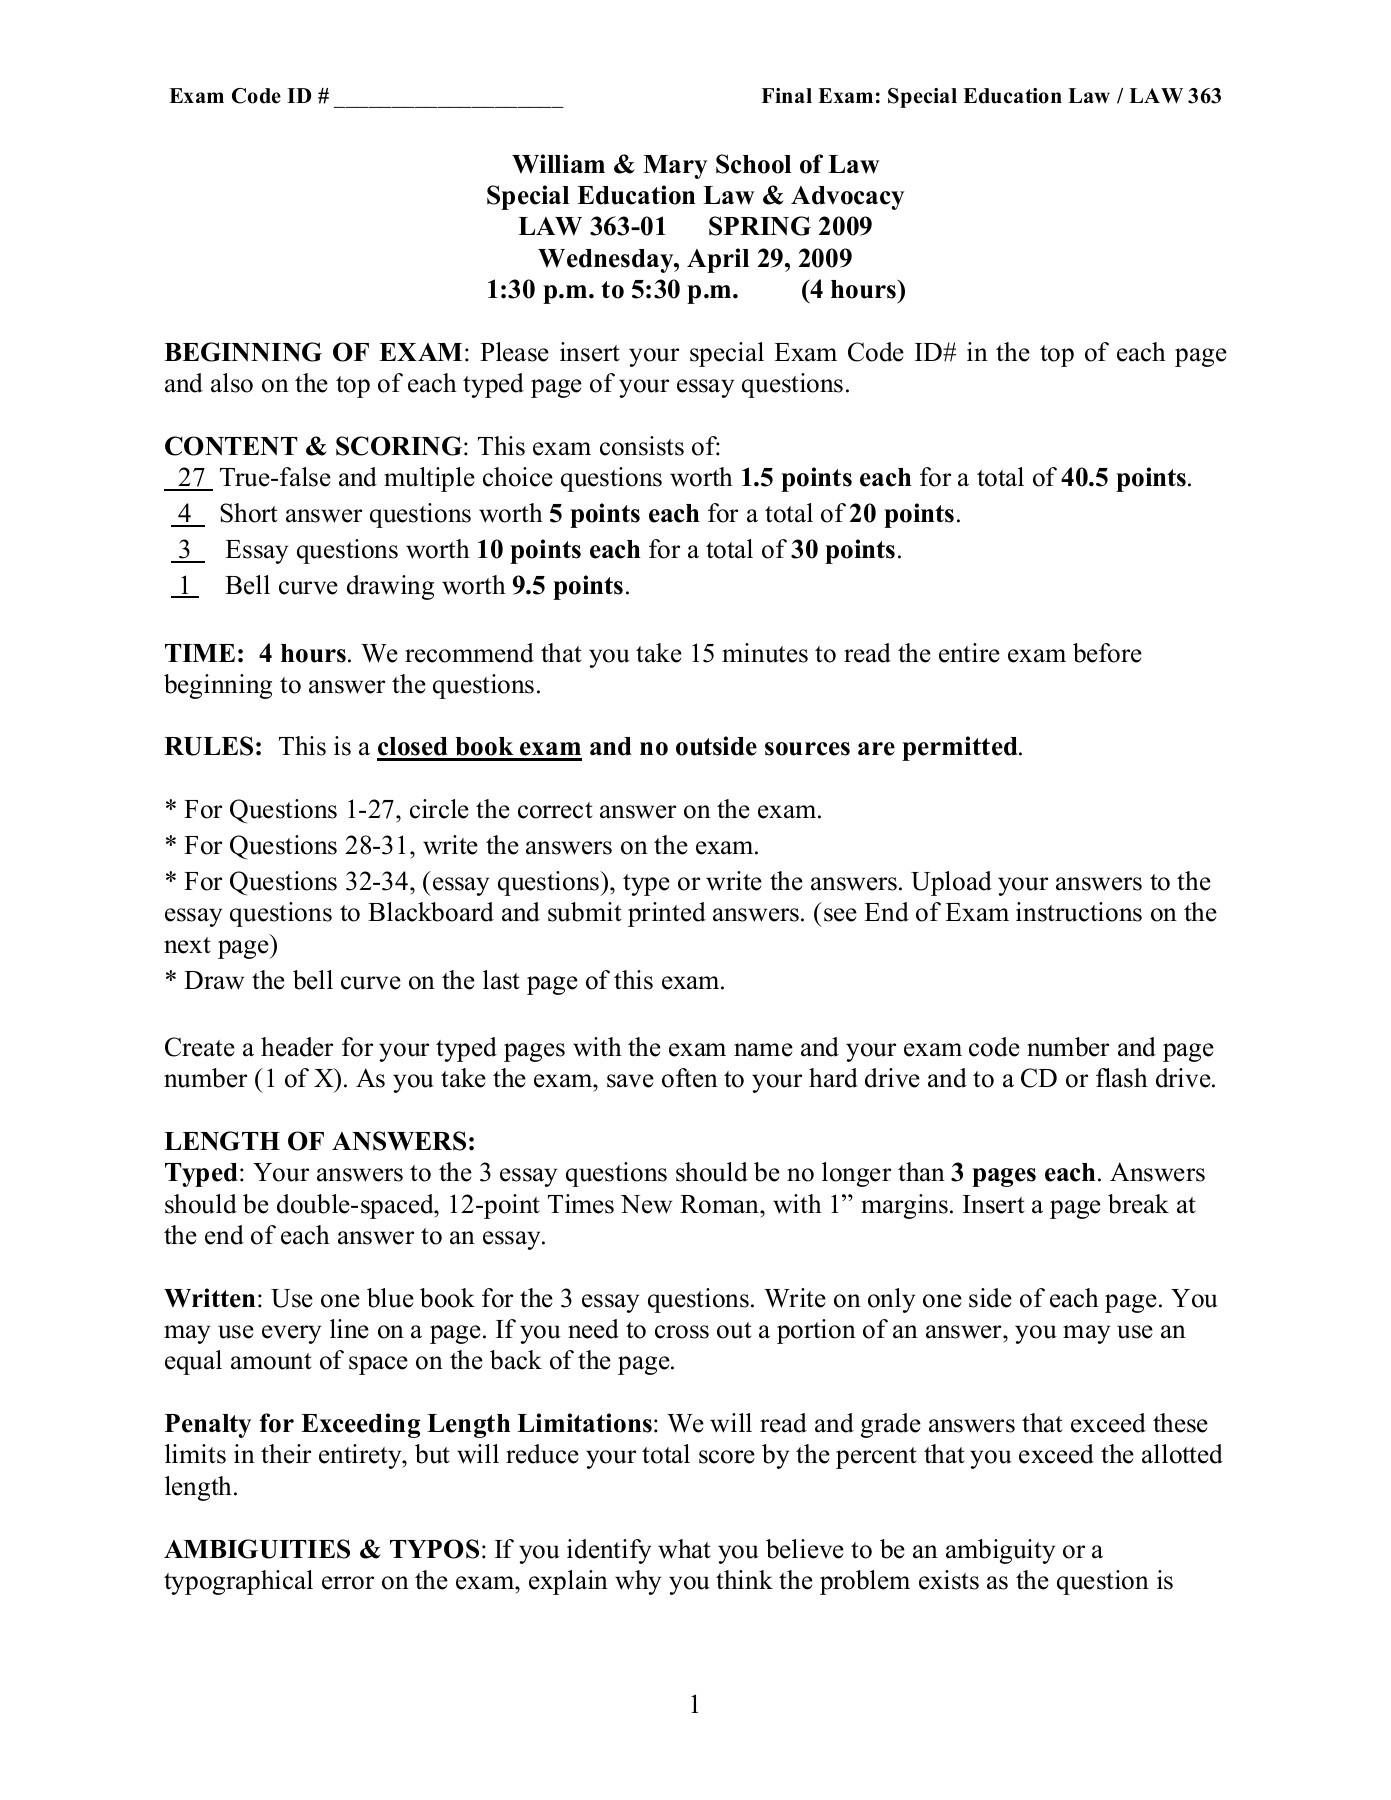 Dissertation thesis help college admissions program